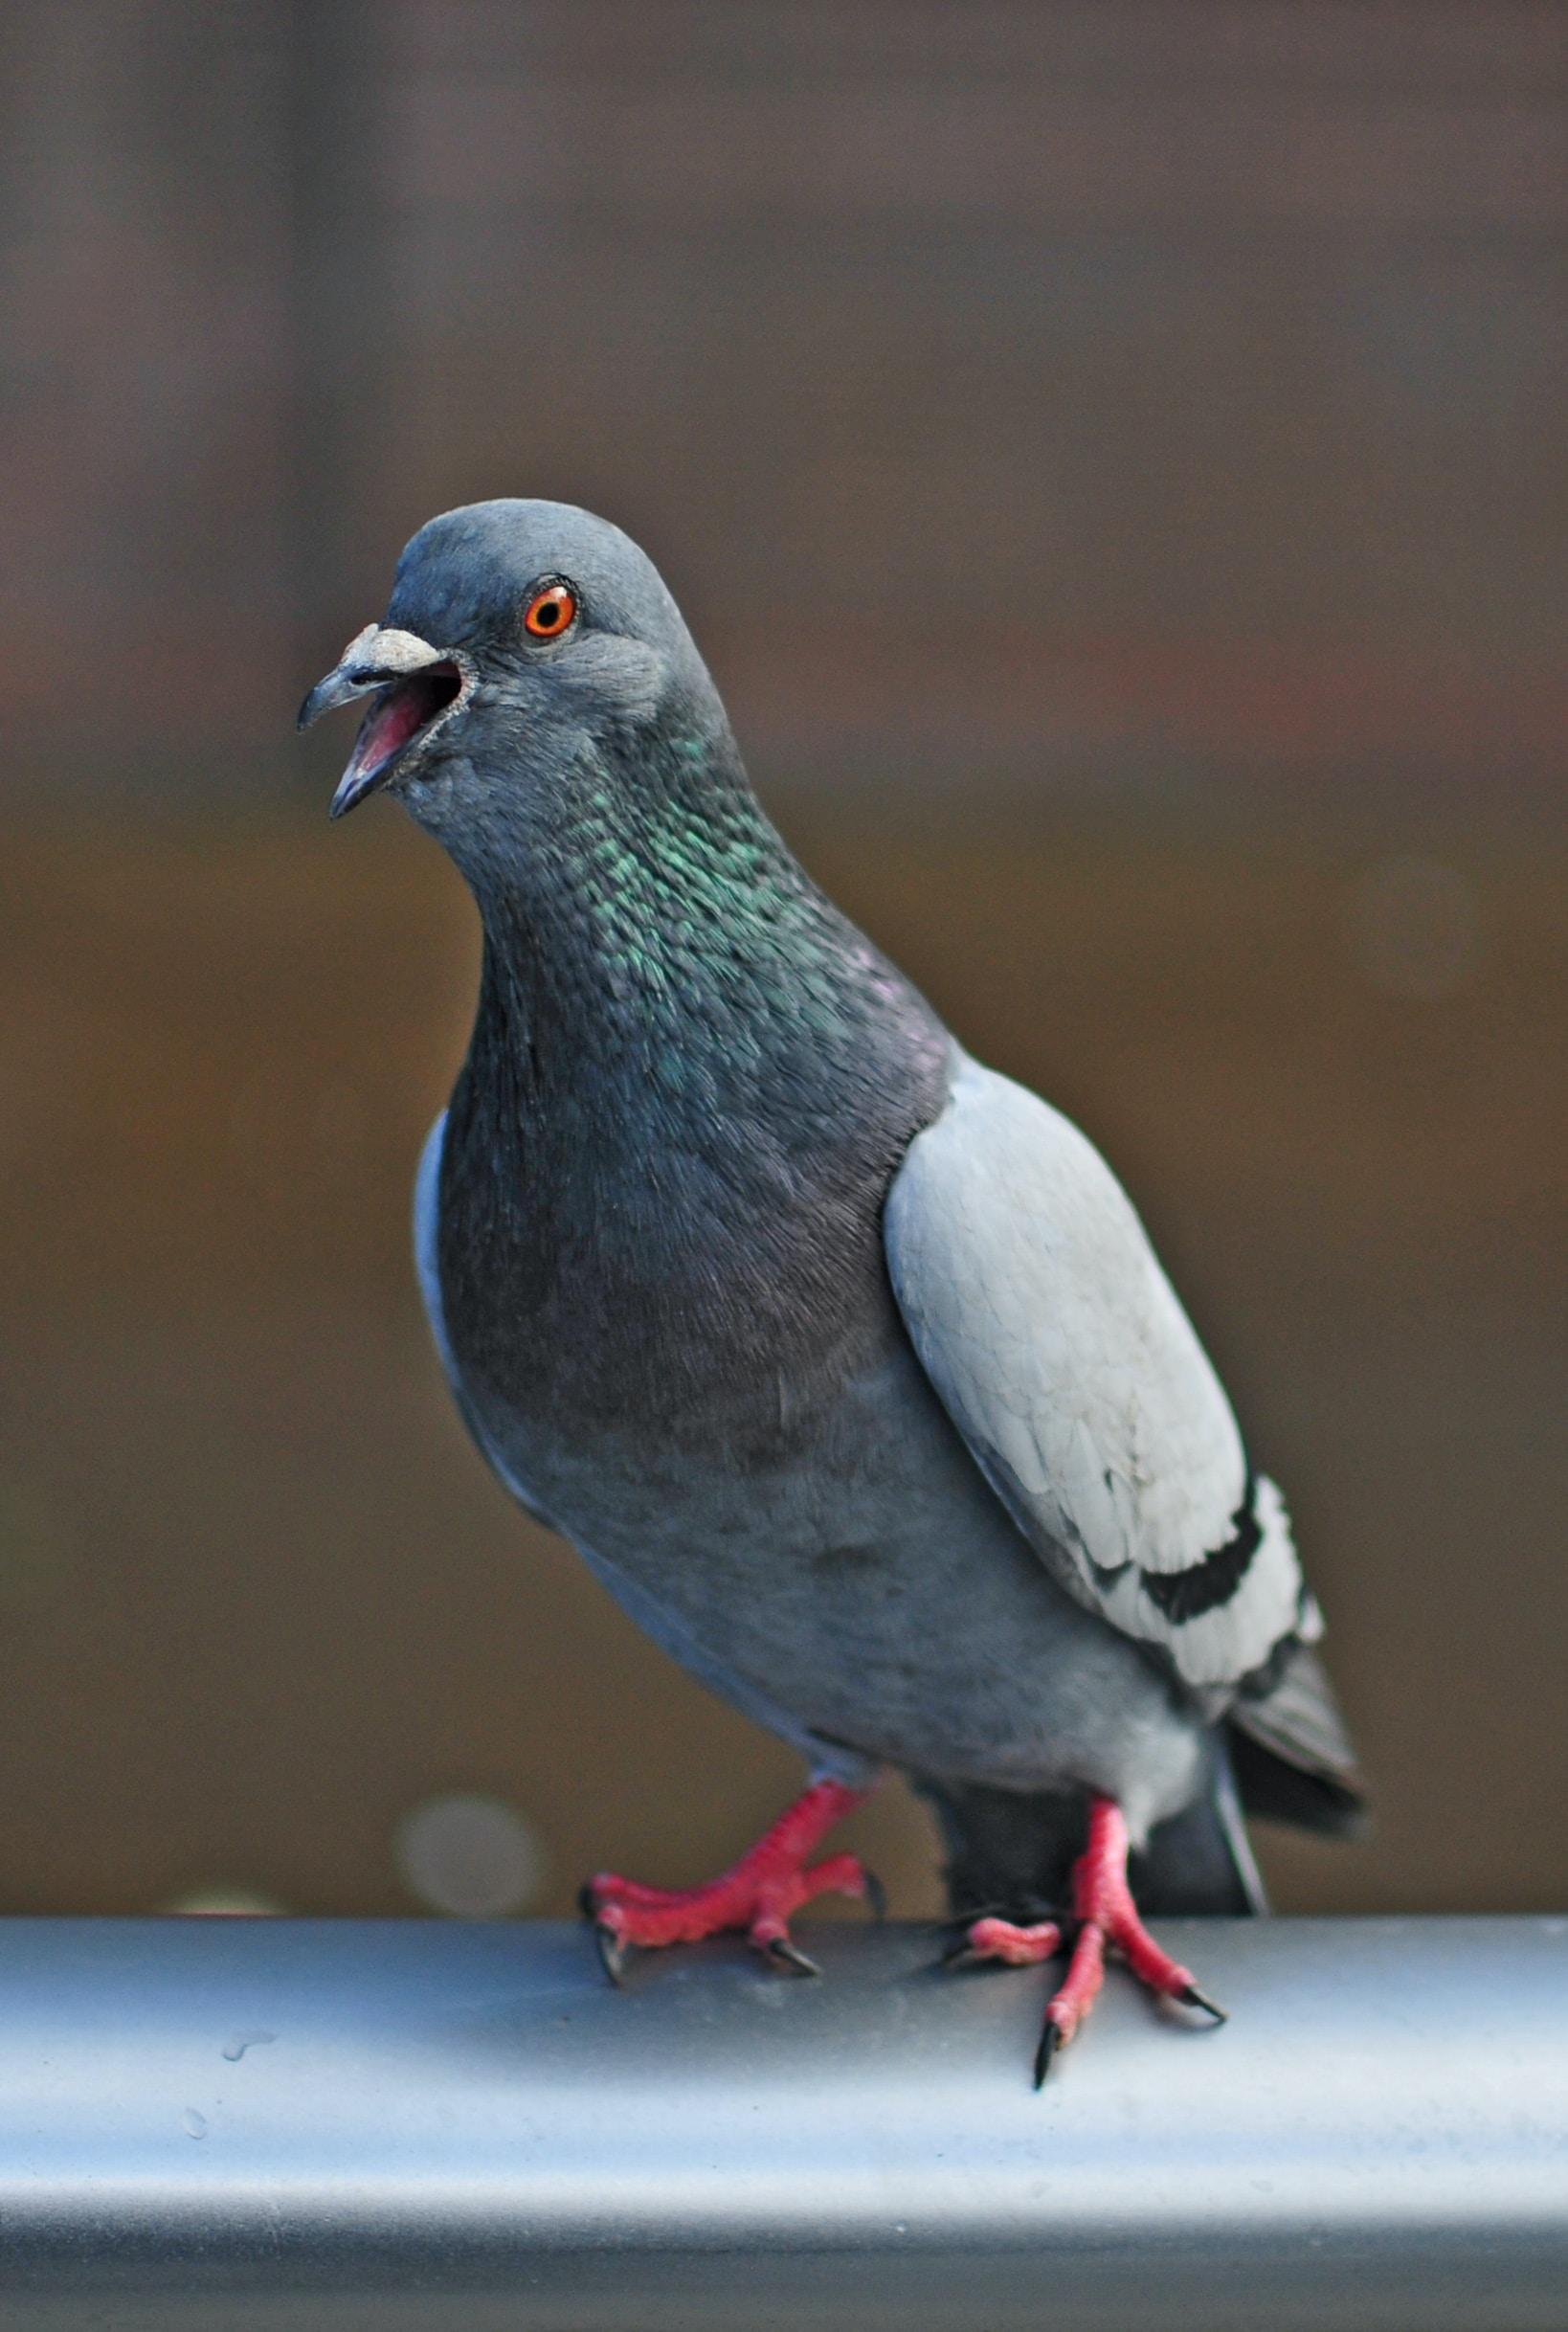 grey pigeon on grey metal rod